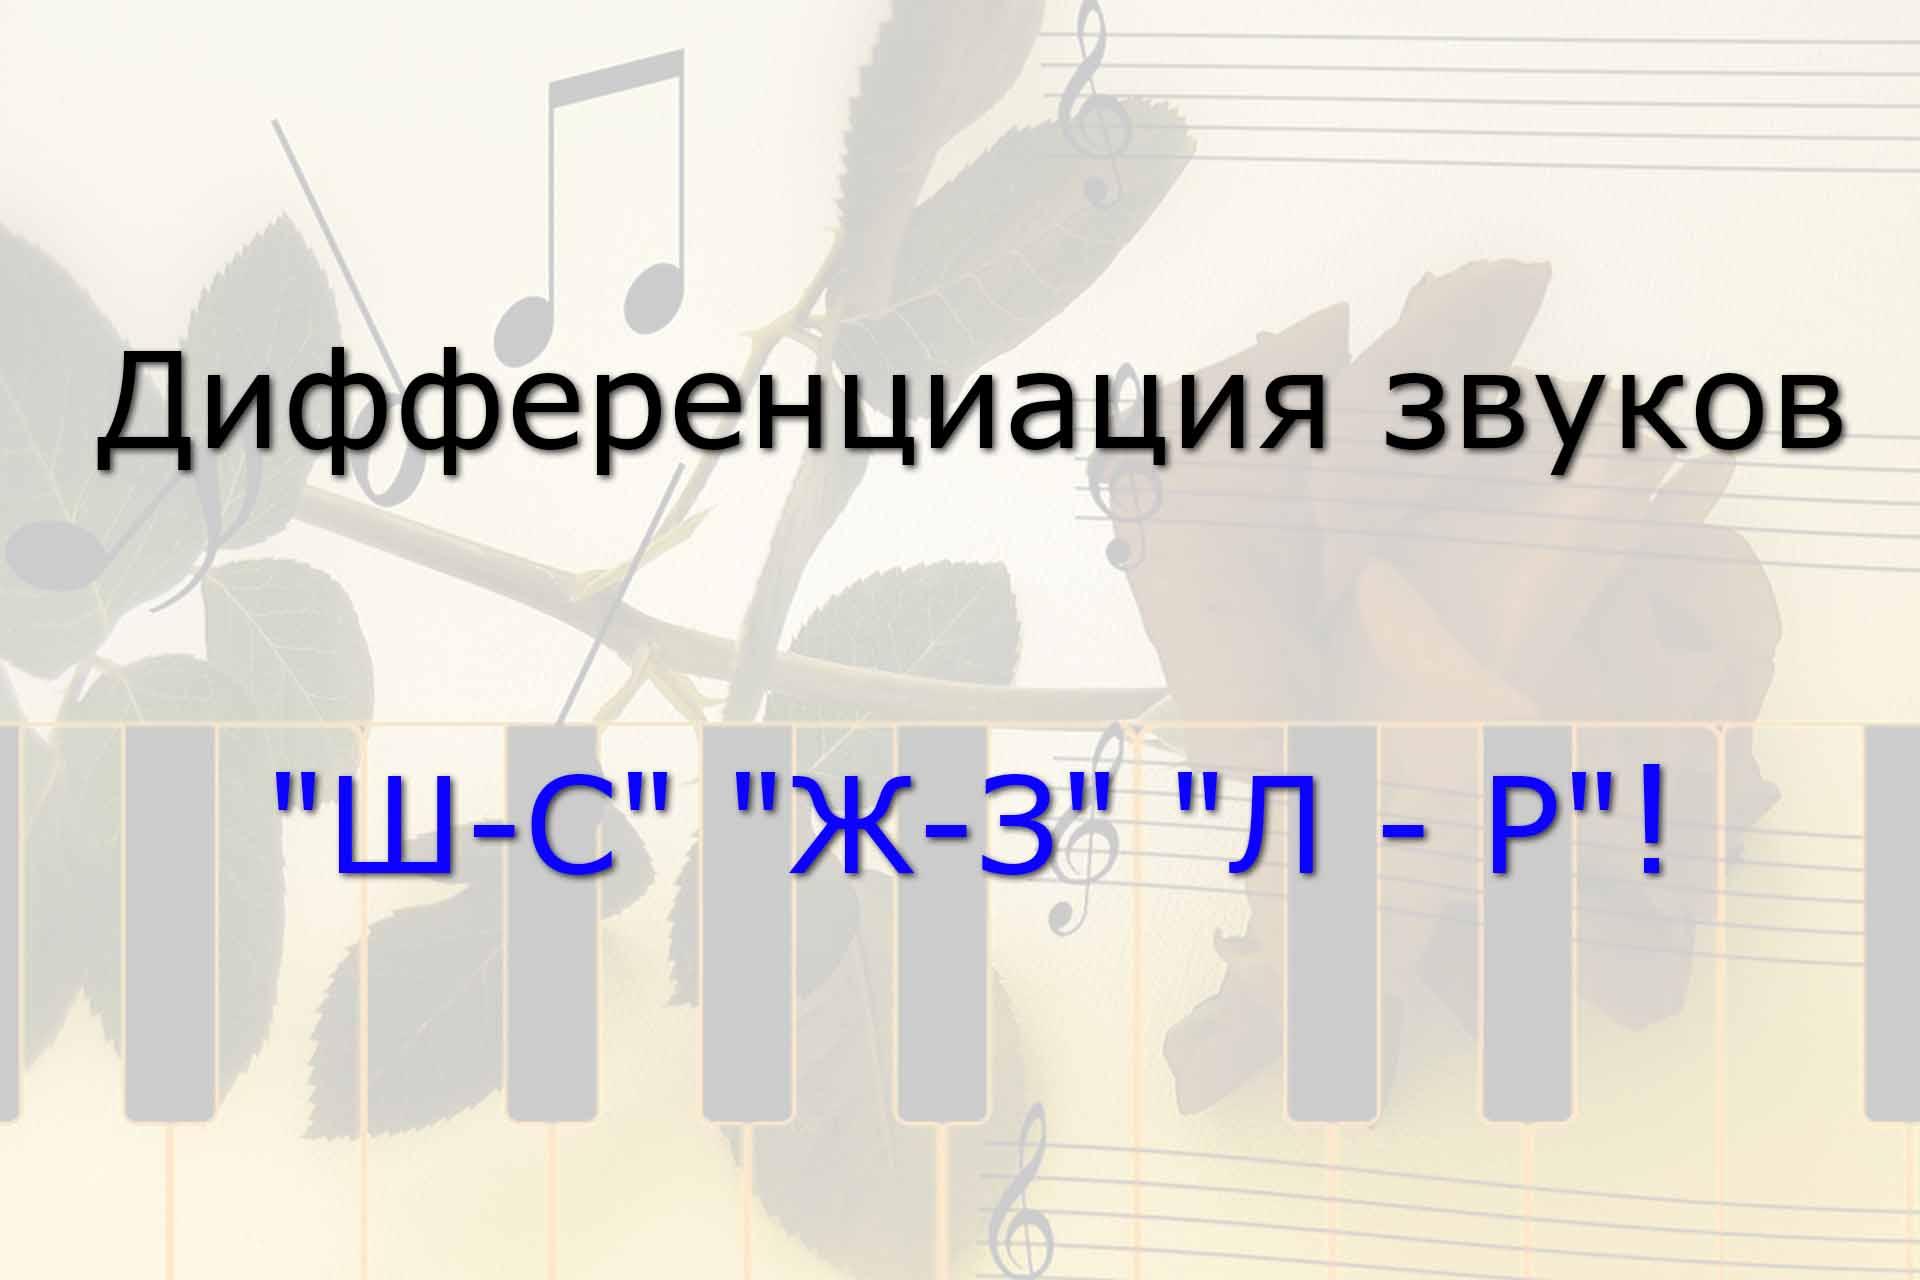 Вебинар по диференциации звуков Ш С Ж З Л Р